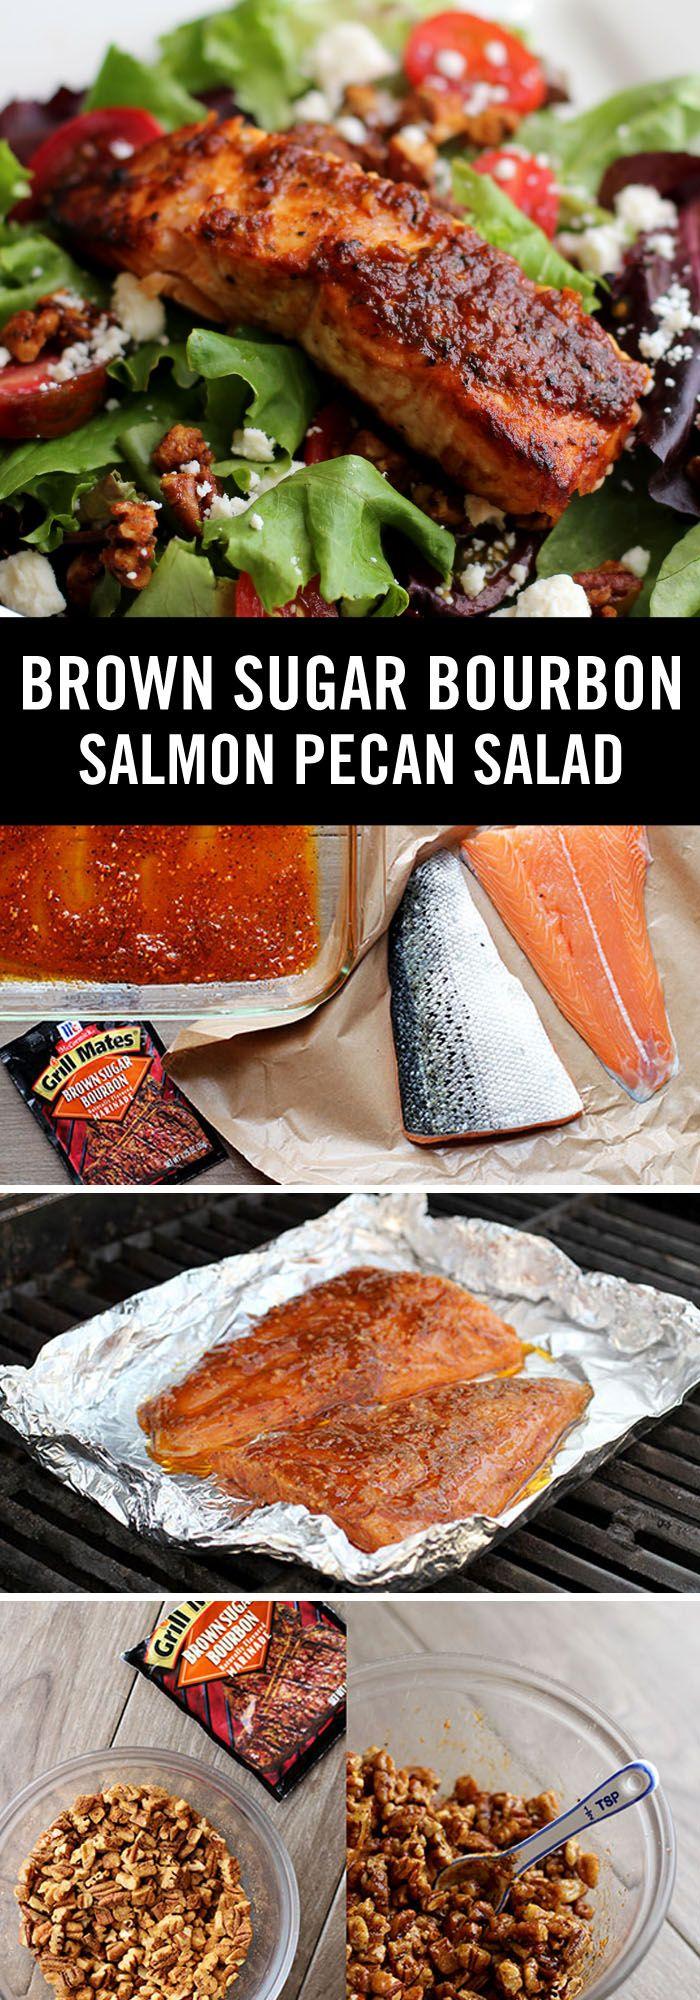 25 best ideas about Brown sugar salmon on Pinterest